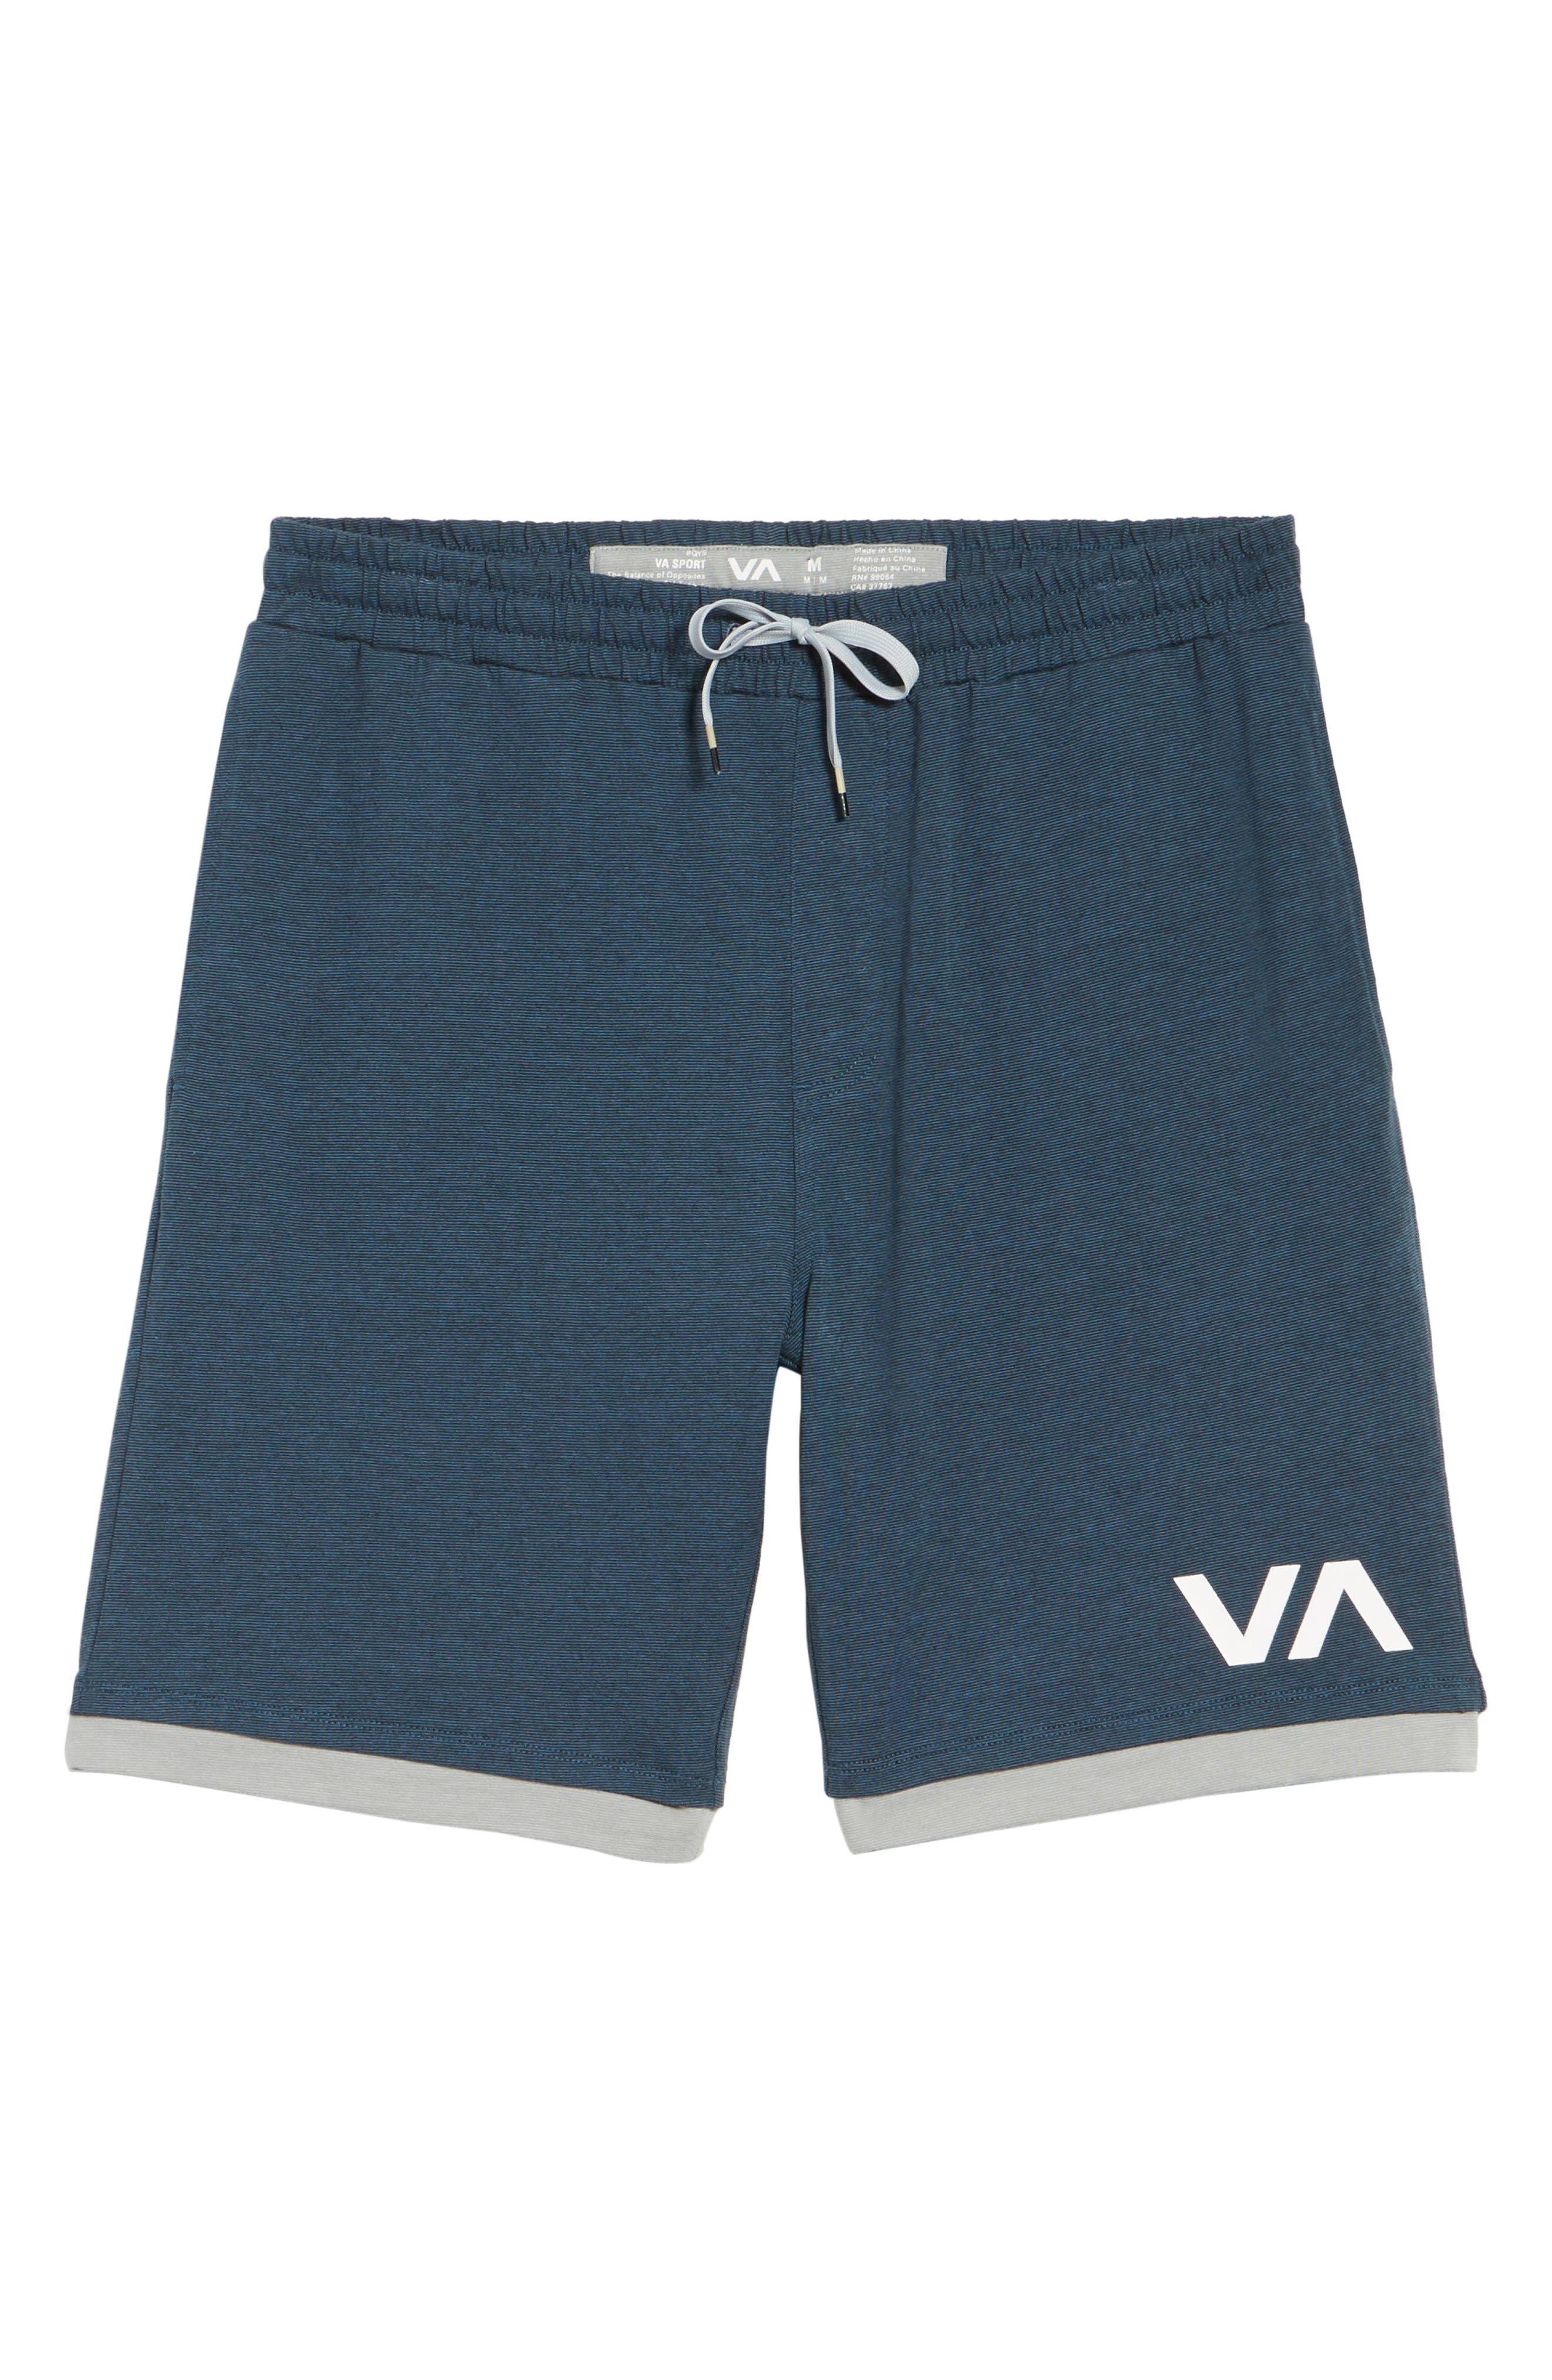 Layers Sport Shorts,                             Alternate thumbnail 17, color,